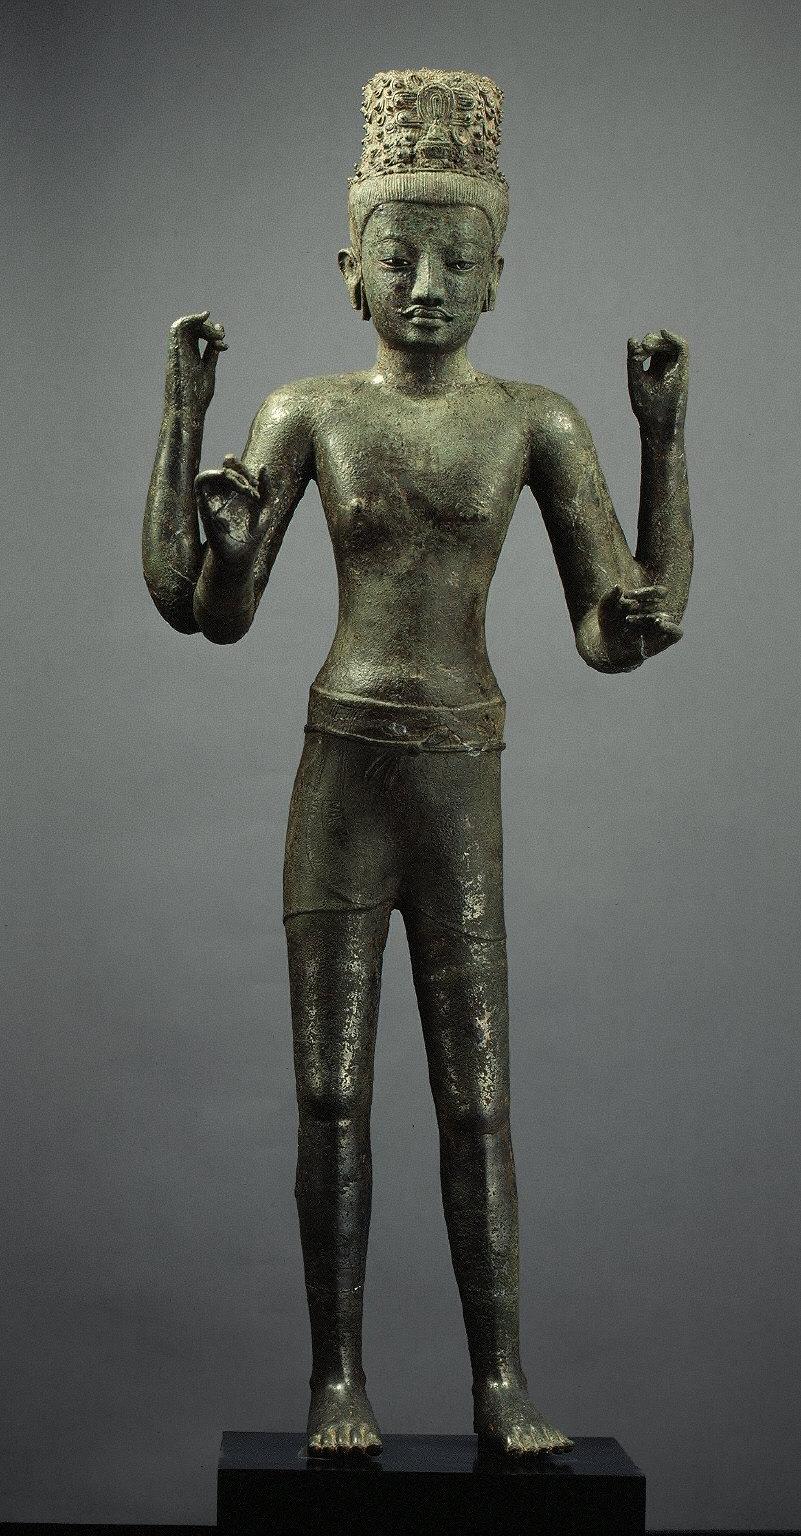 Four-armed Avalokiteshvara (The Bodhisattva of Infinite Compassion)